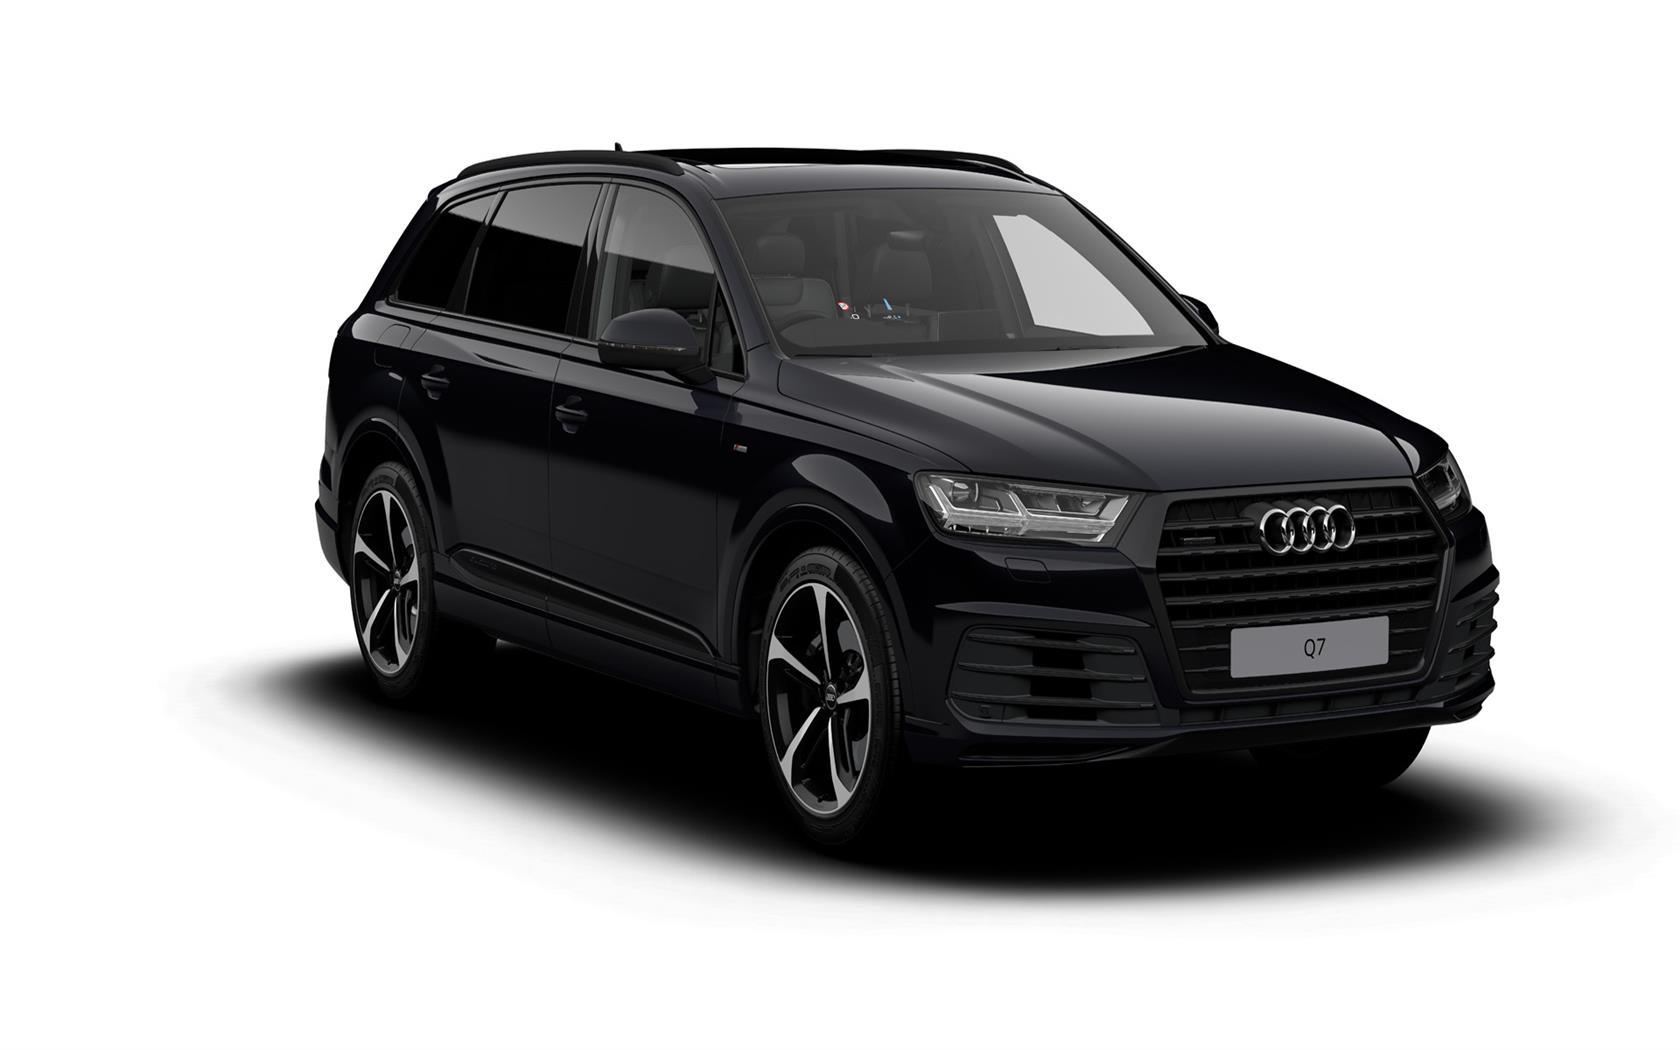 2018 Audi Q7 Black Edition